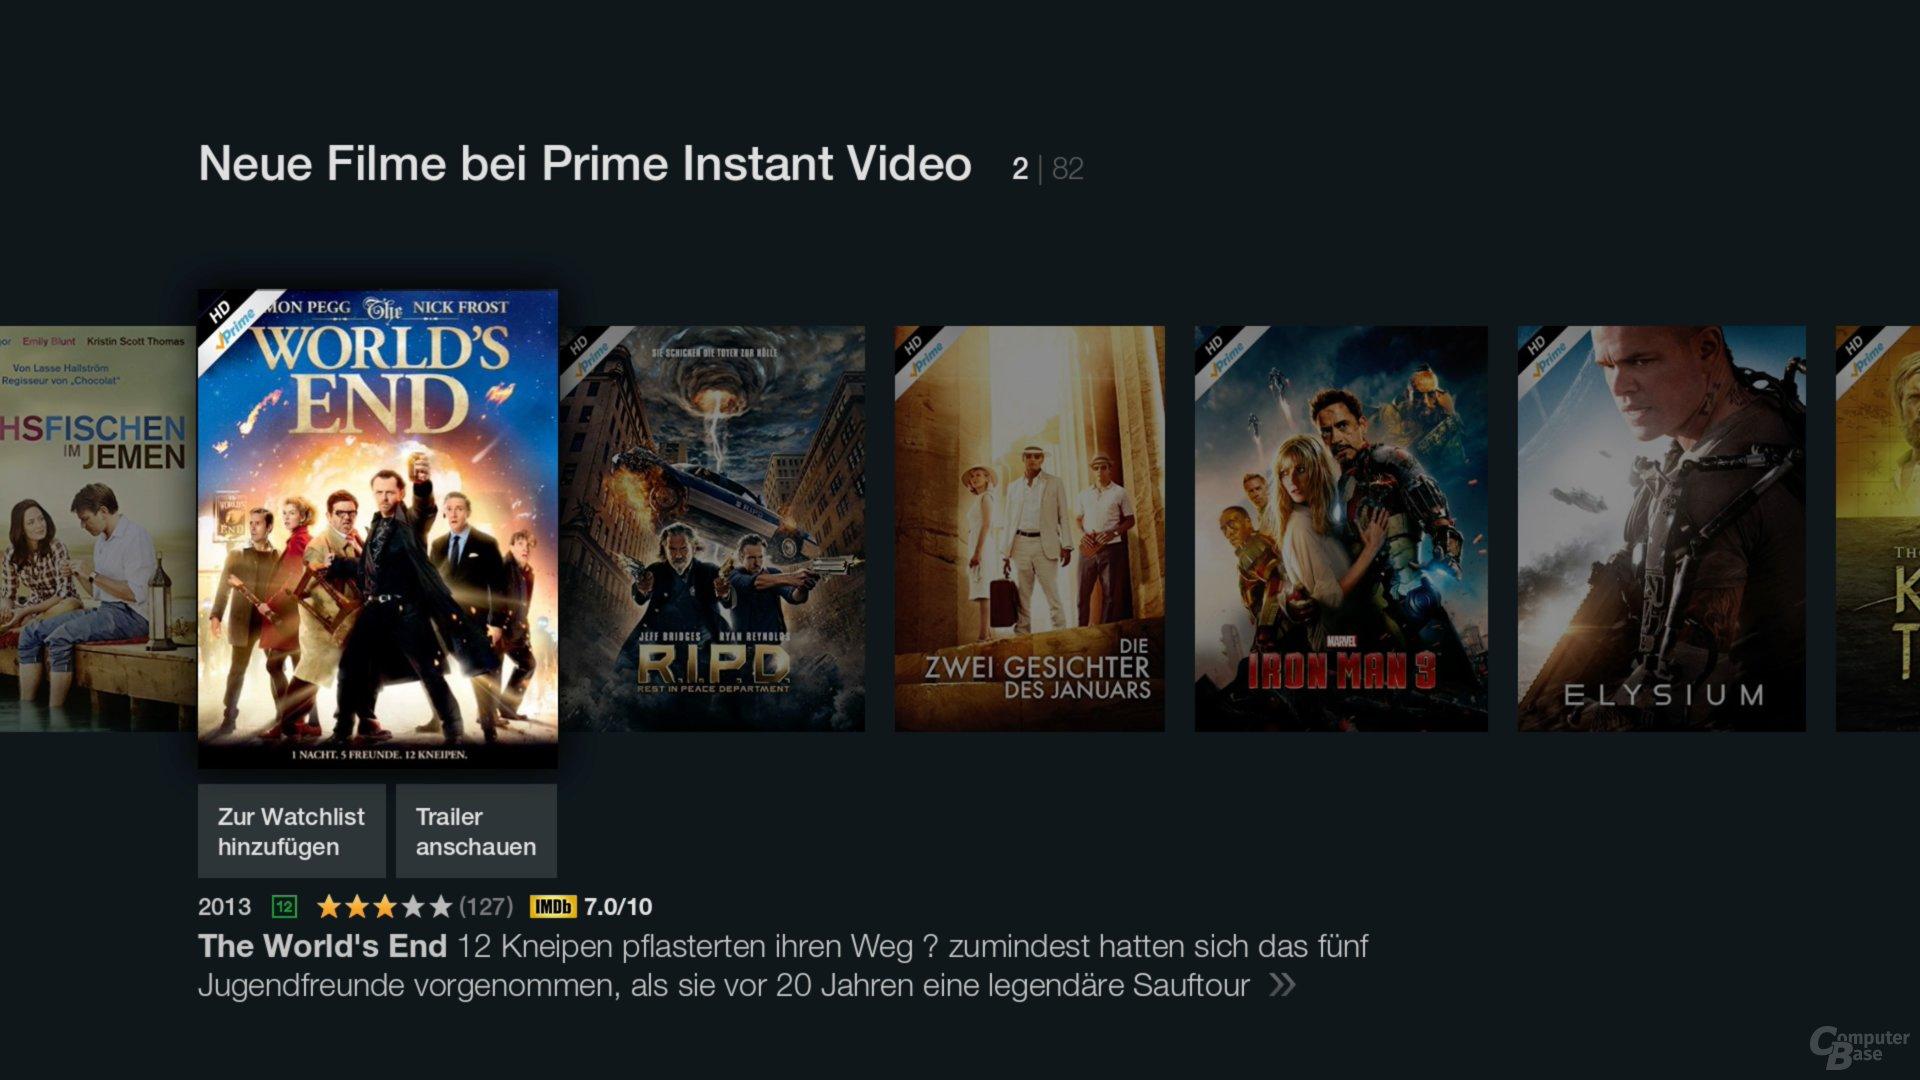 Amazon Fire TV Stick – Neue Filme bei Prime Instant Video